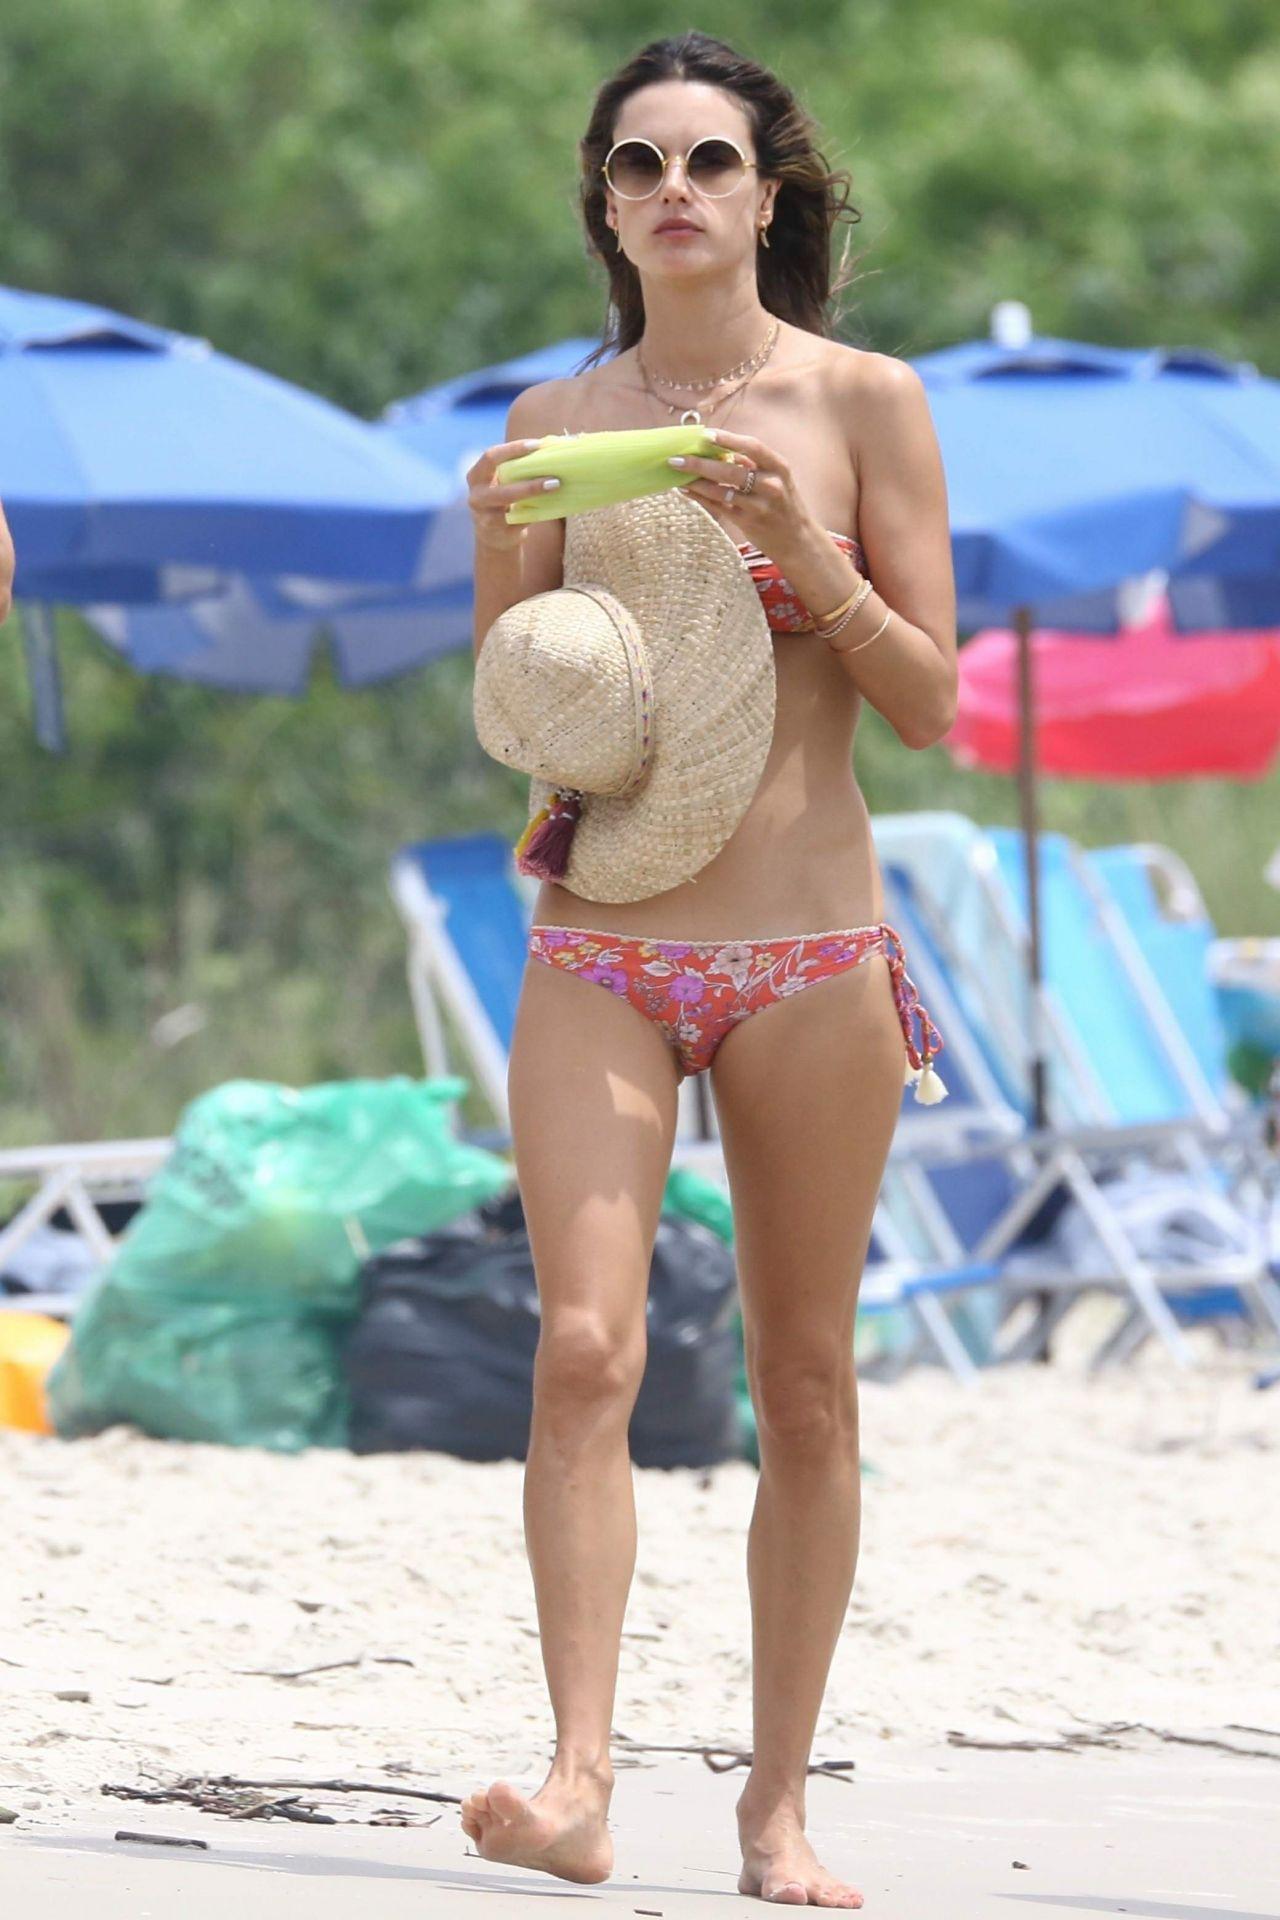 Alessandra Ambrosio in a bikini on the beach in Florianopolis